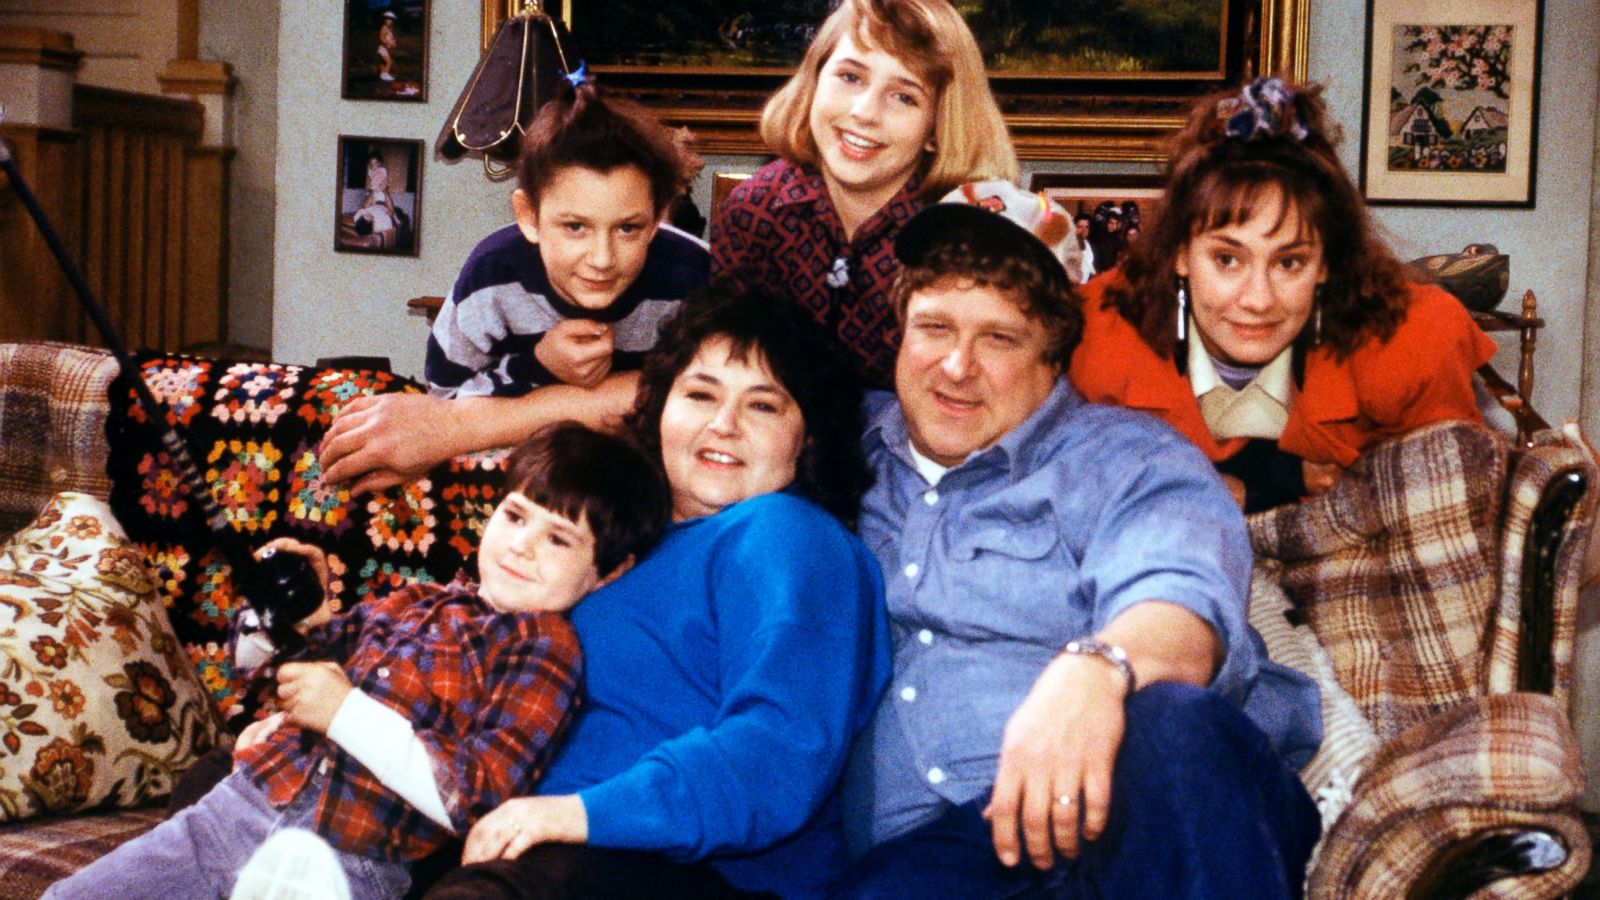 'Roseanne' Detalles del debut oficial